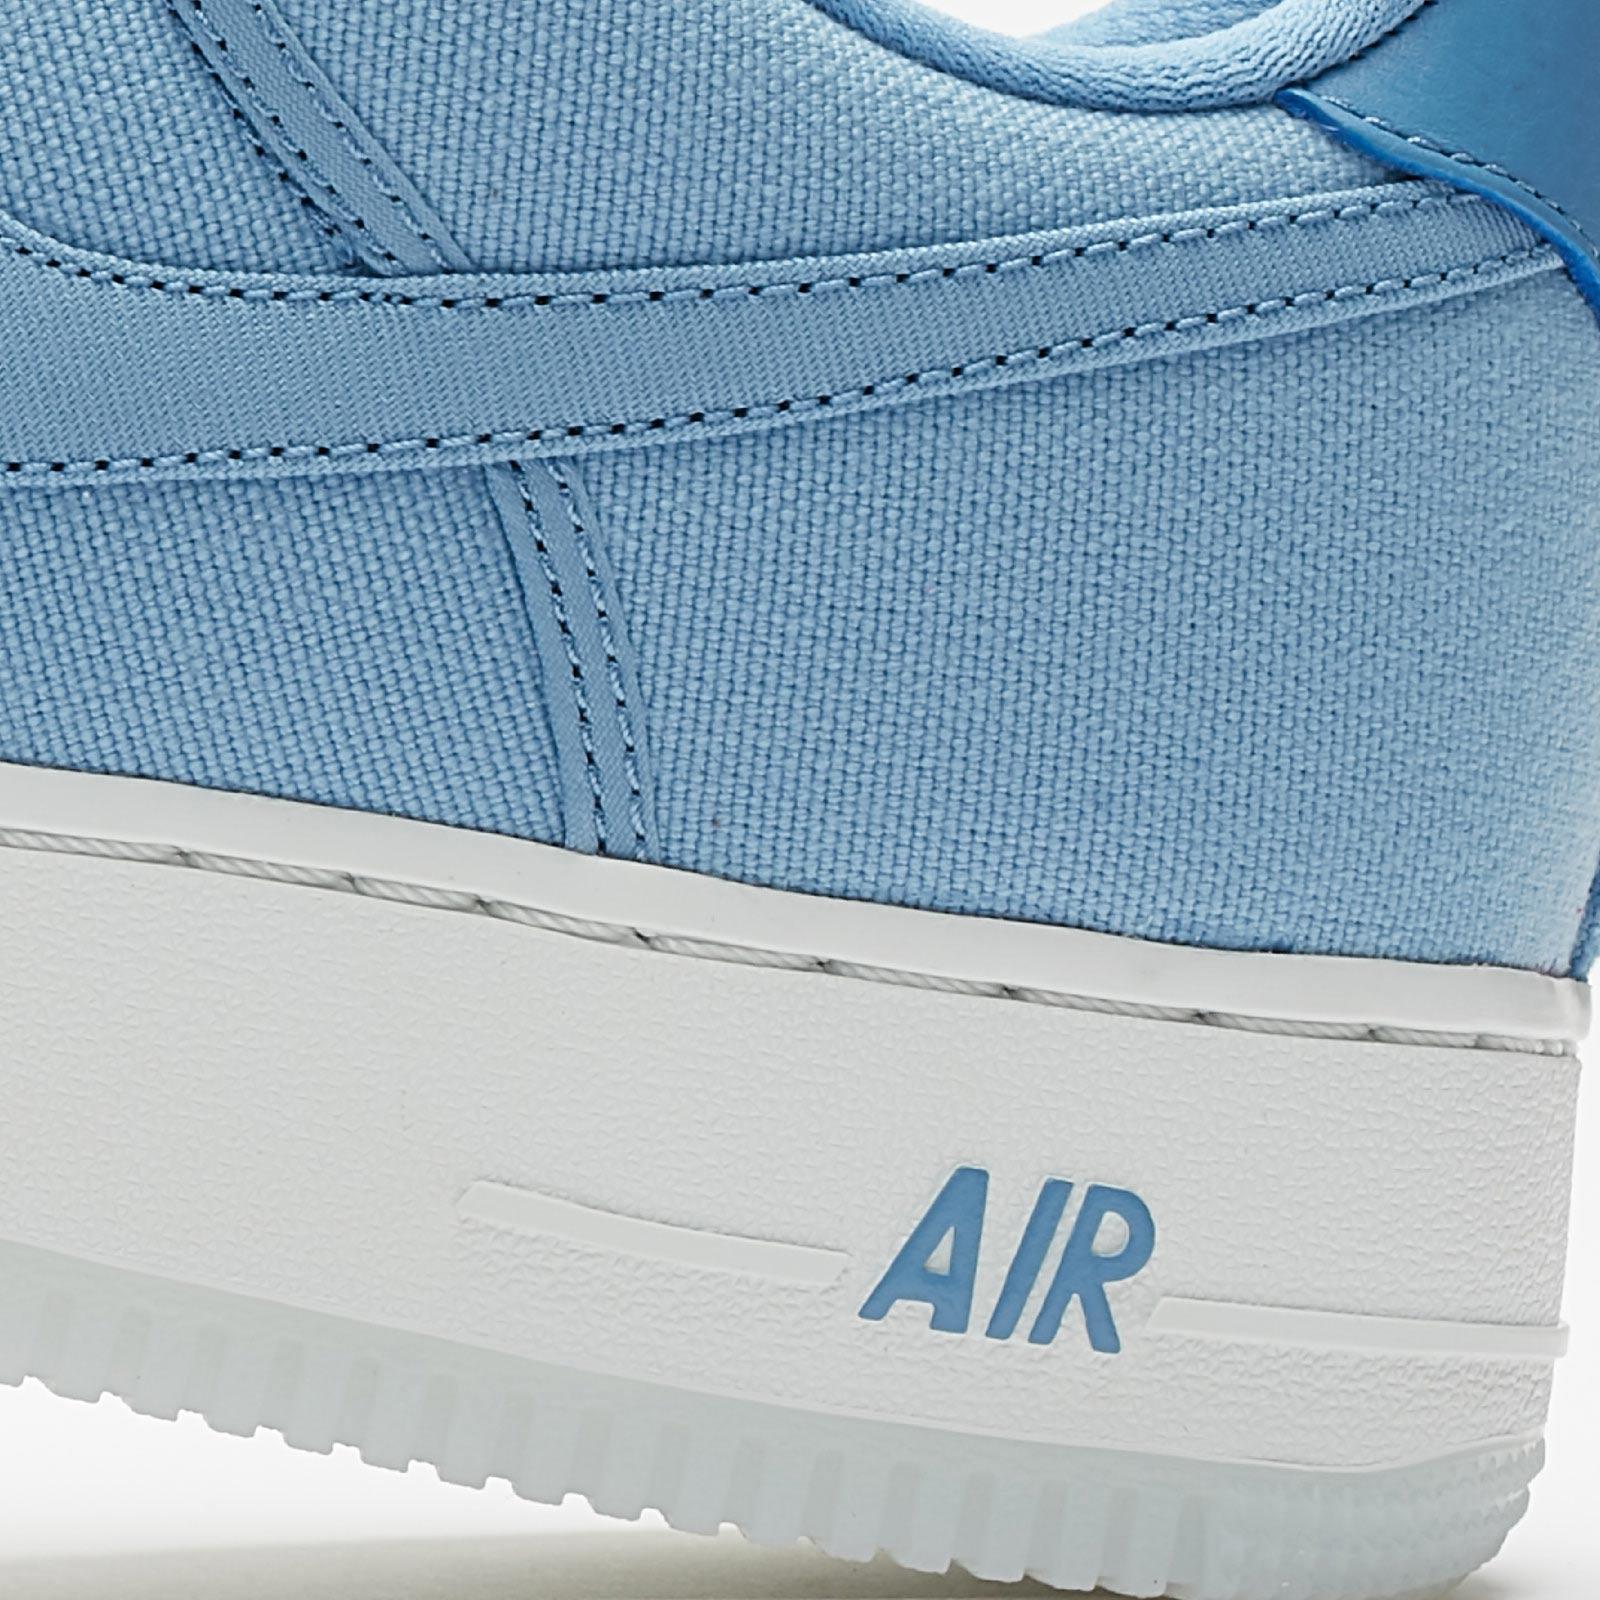 Nike Air Force 1 Low Retro QS Cnvs - Ah1067-401 - Sneakersnstuff ... 9c4736328